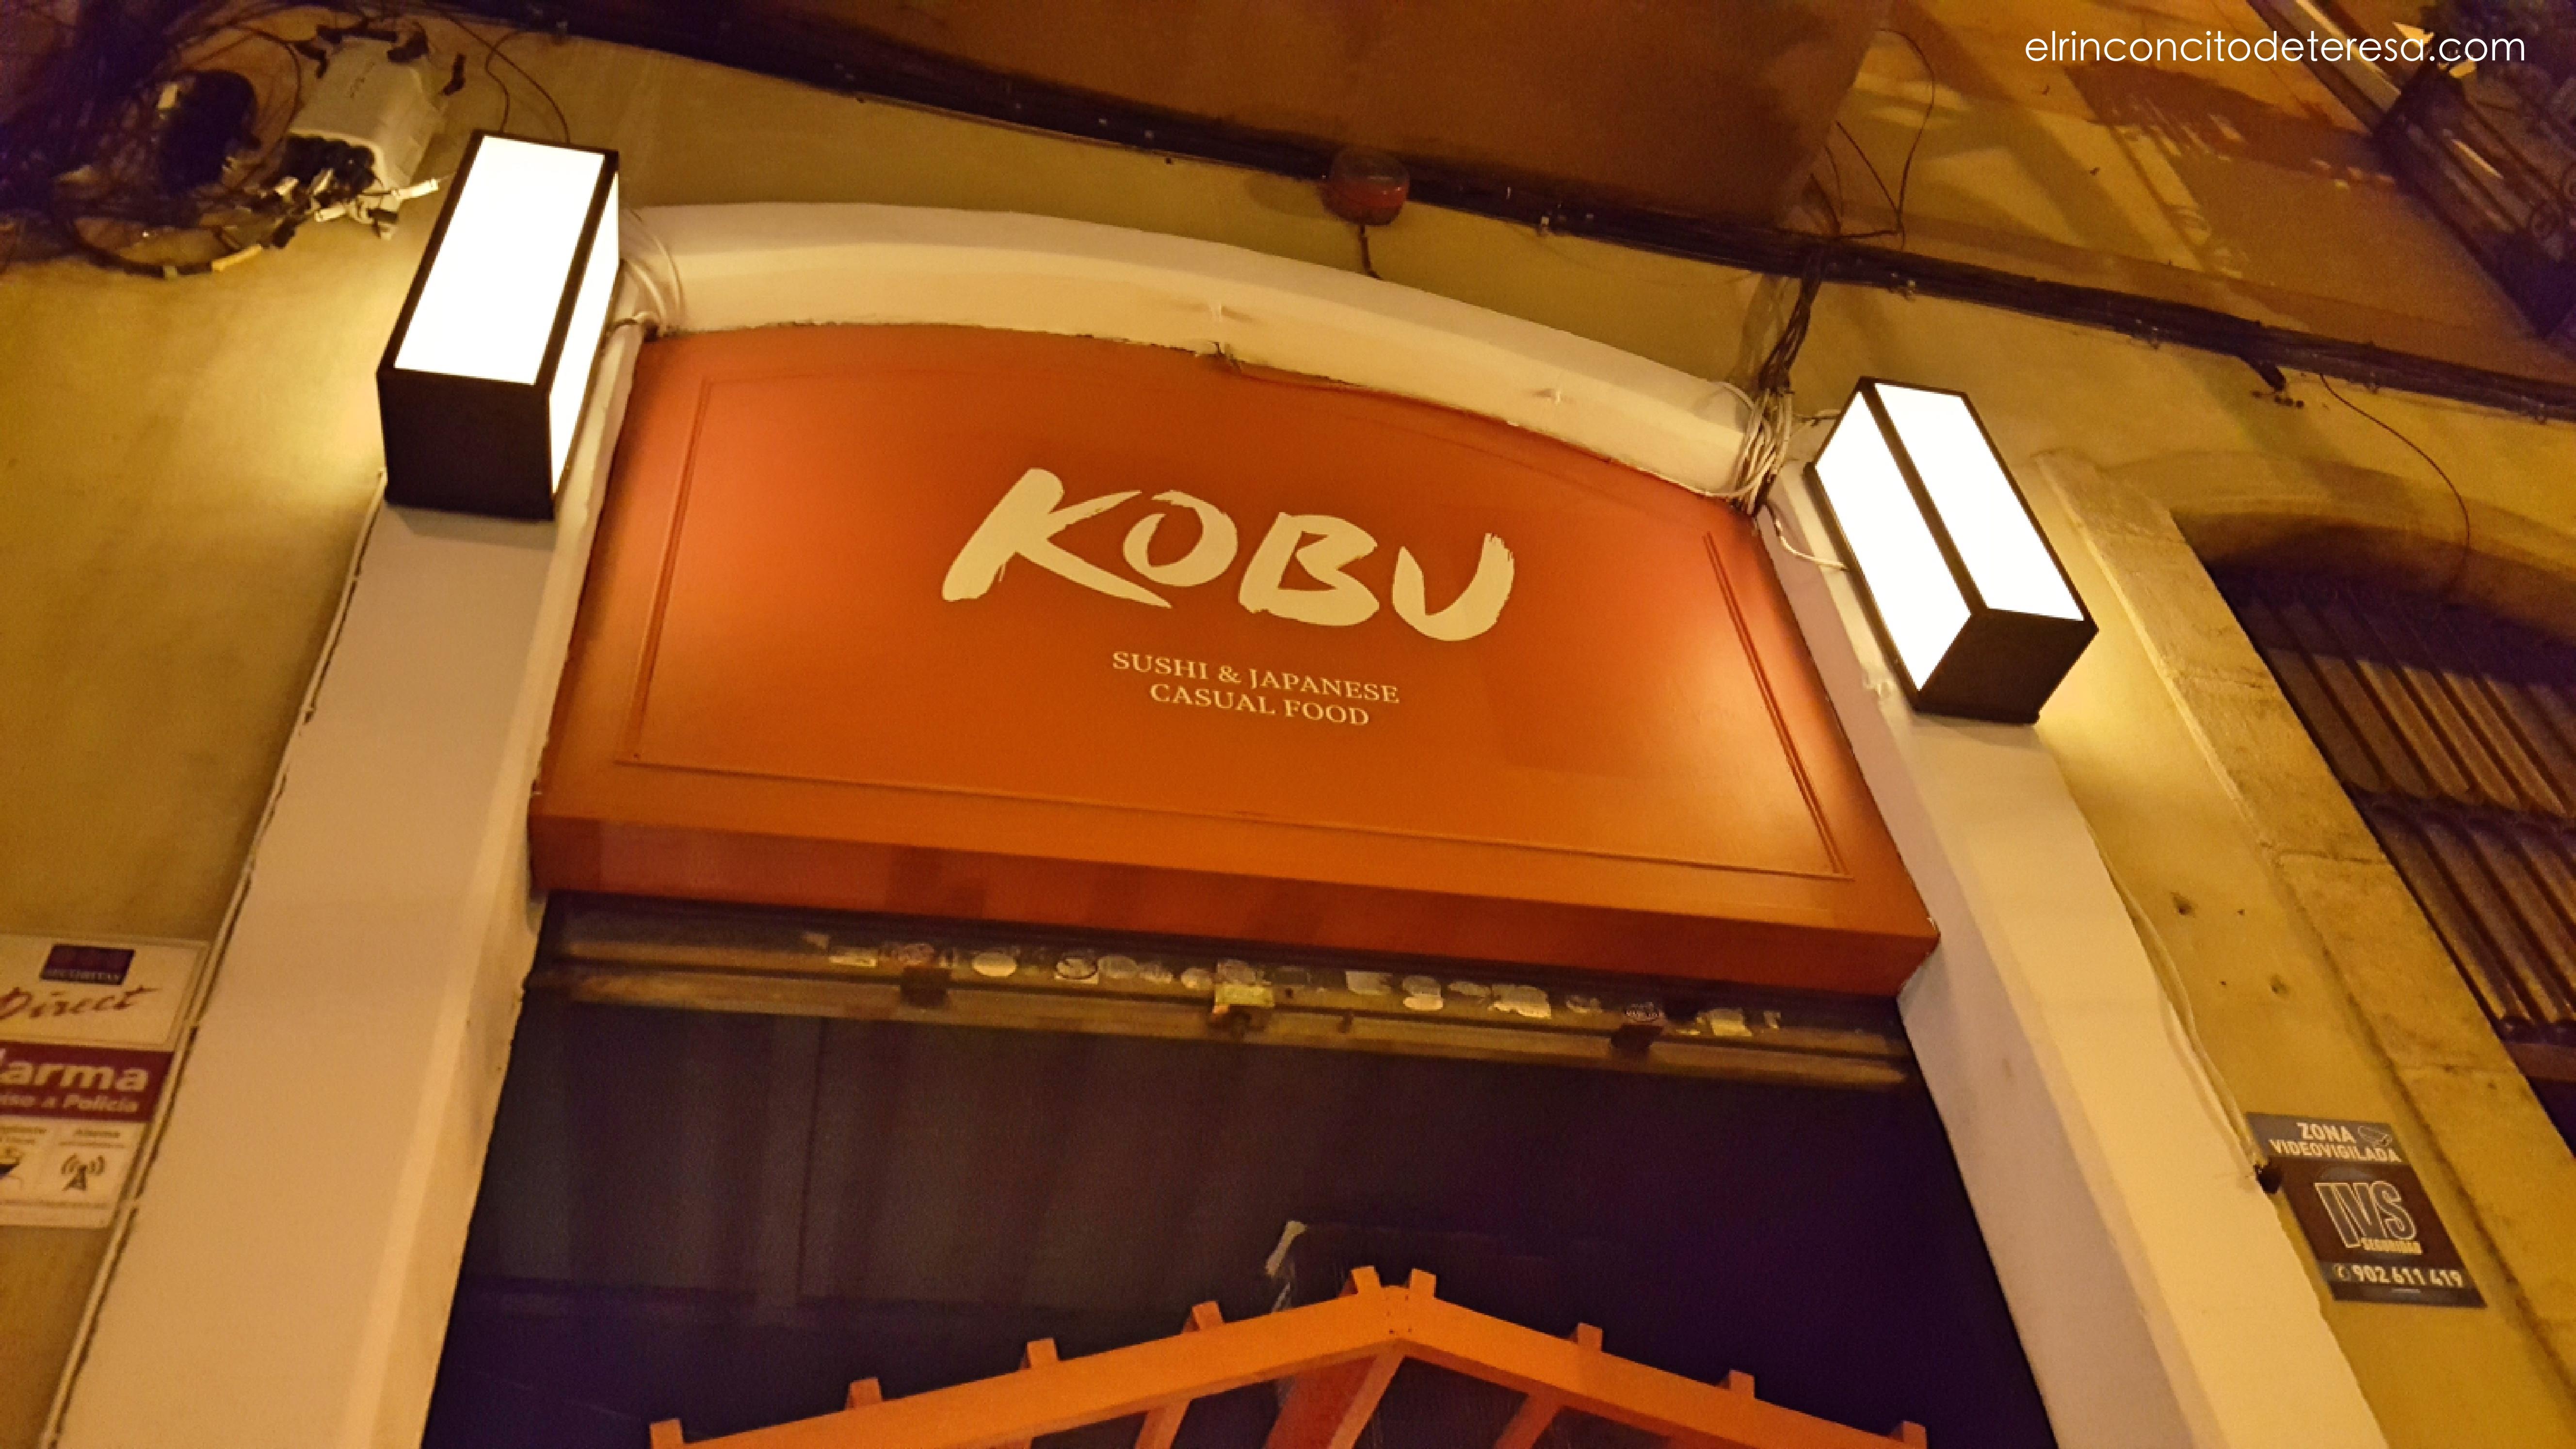 kobu-entrada